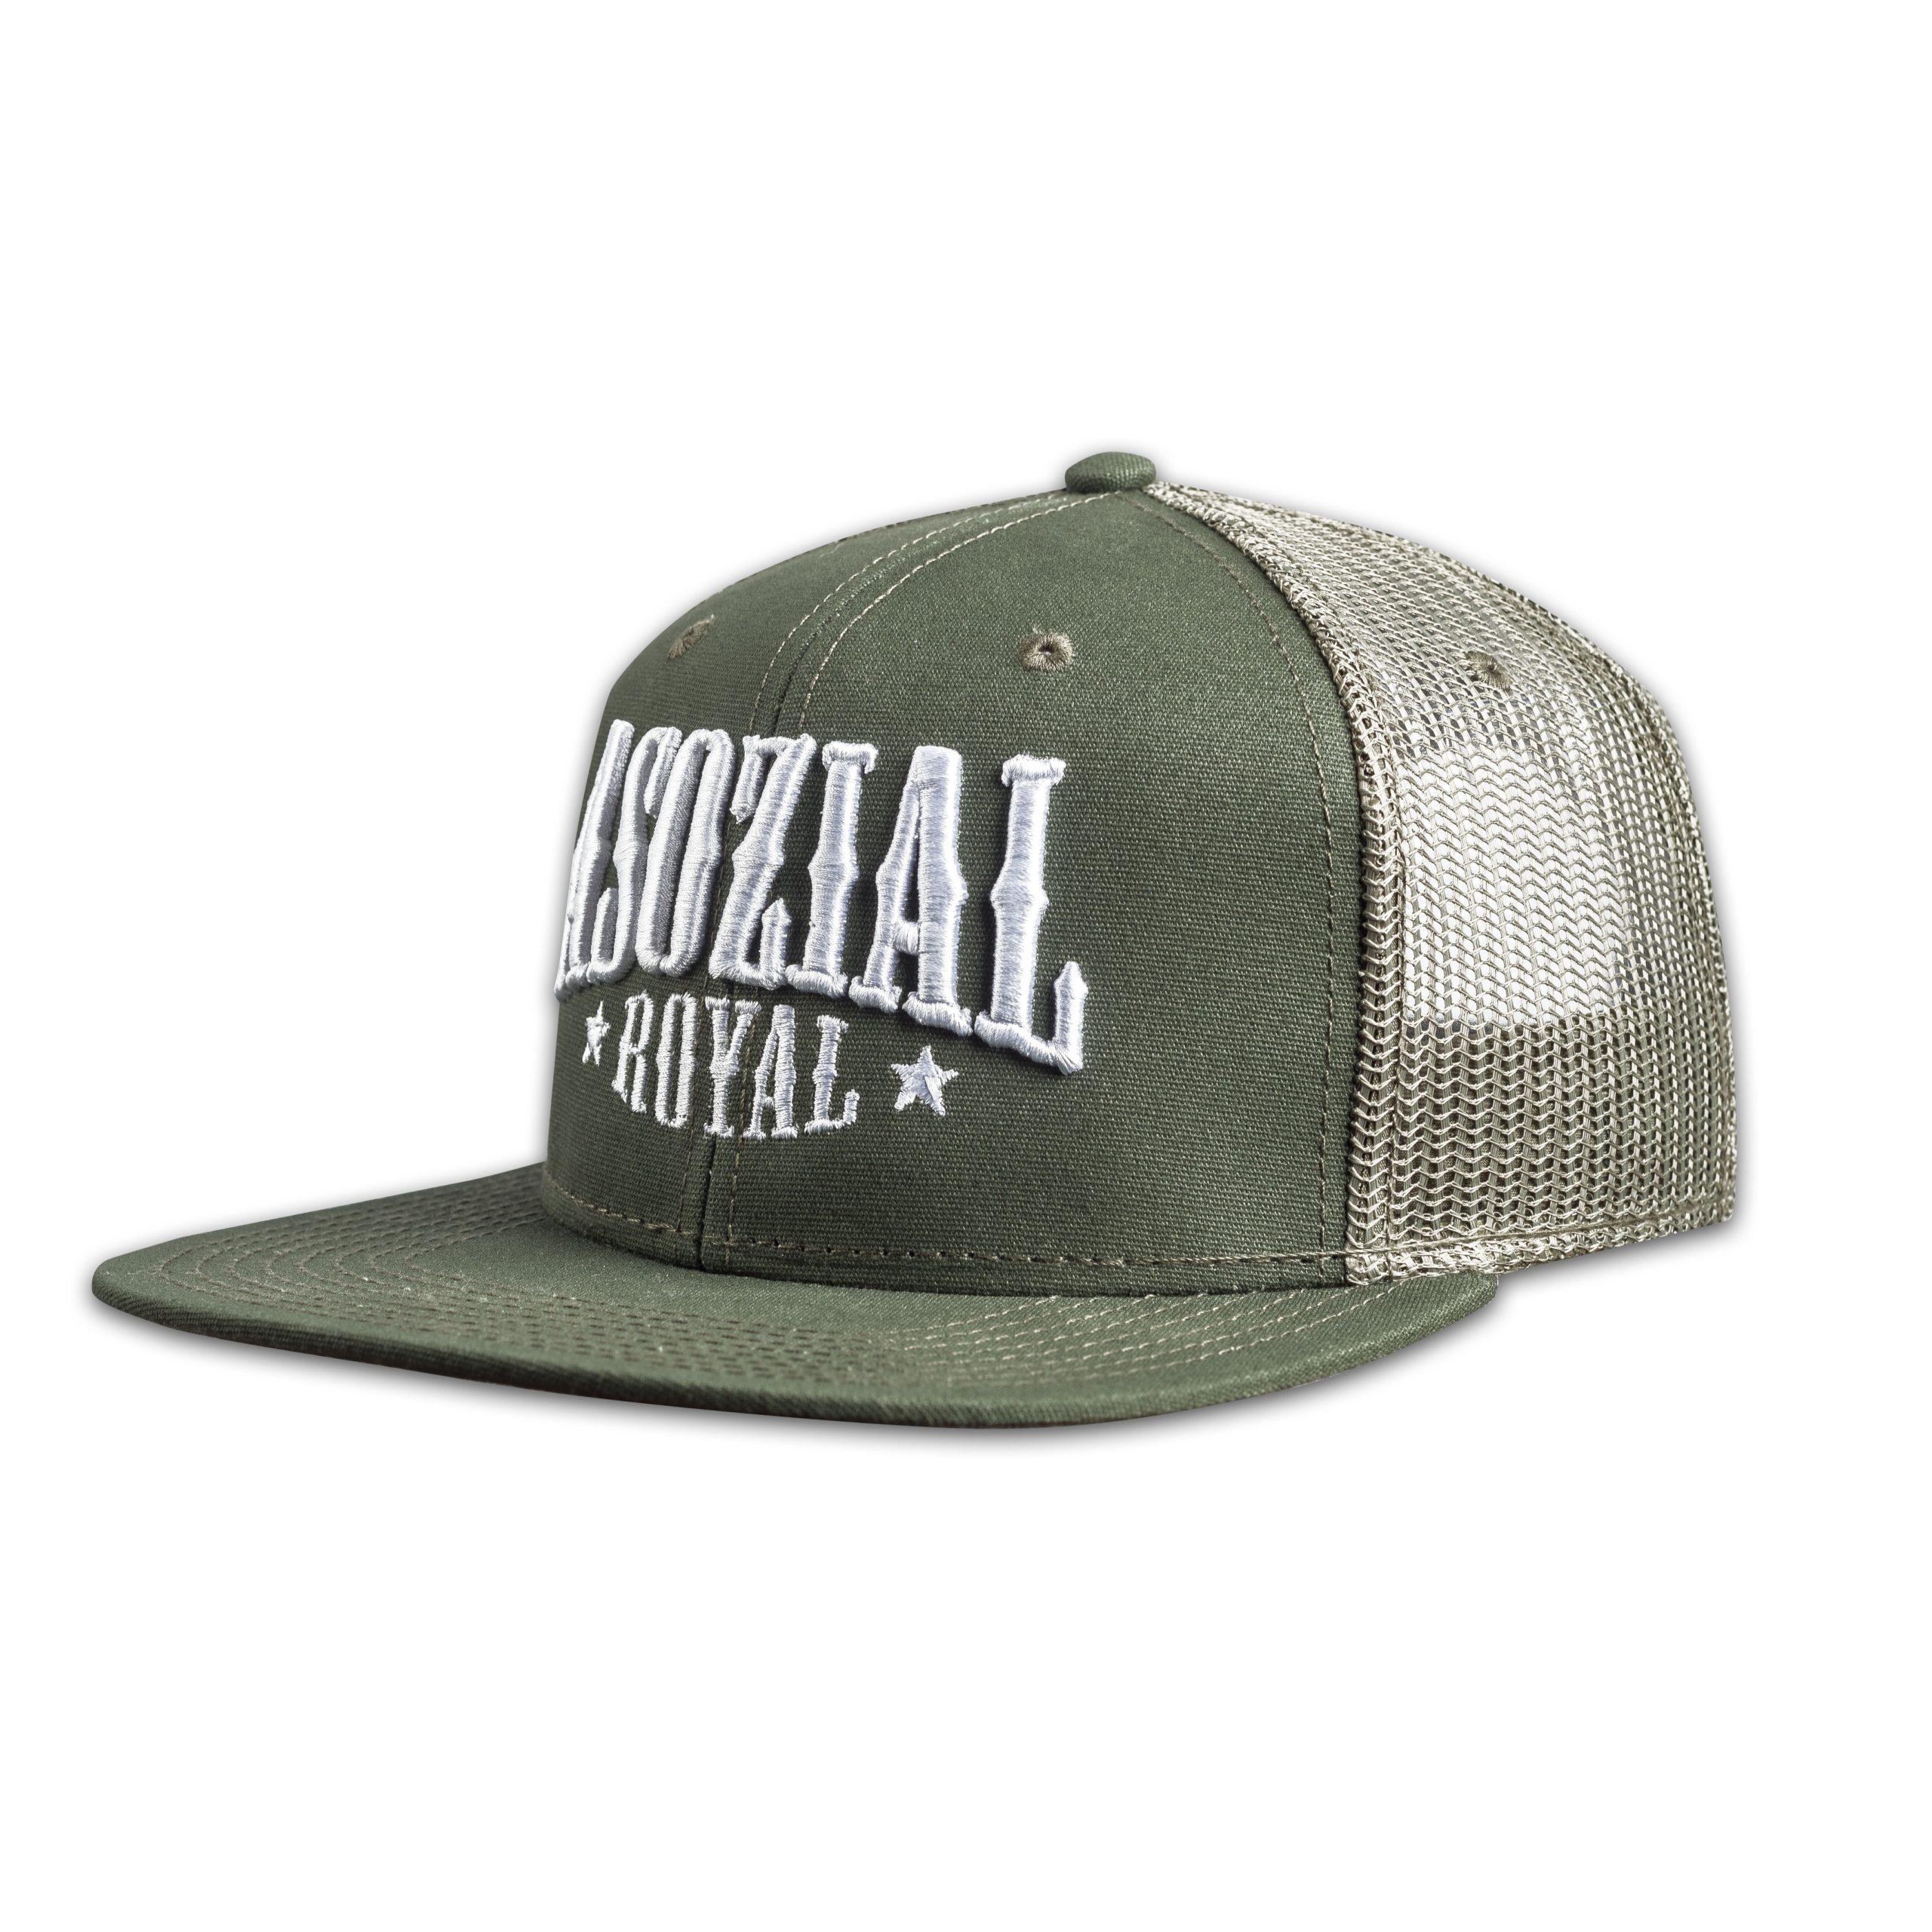 Snapback Cap Asozial Royal Schwarz